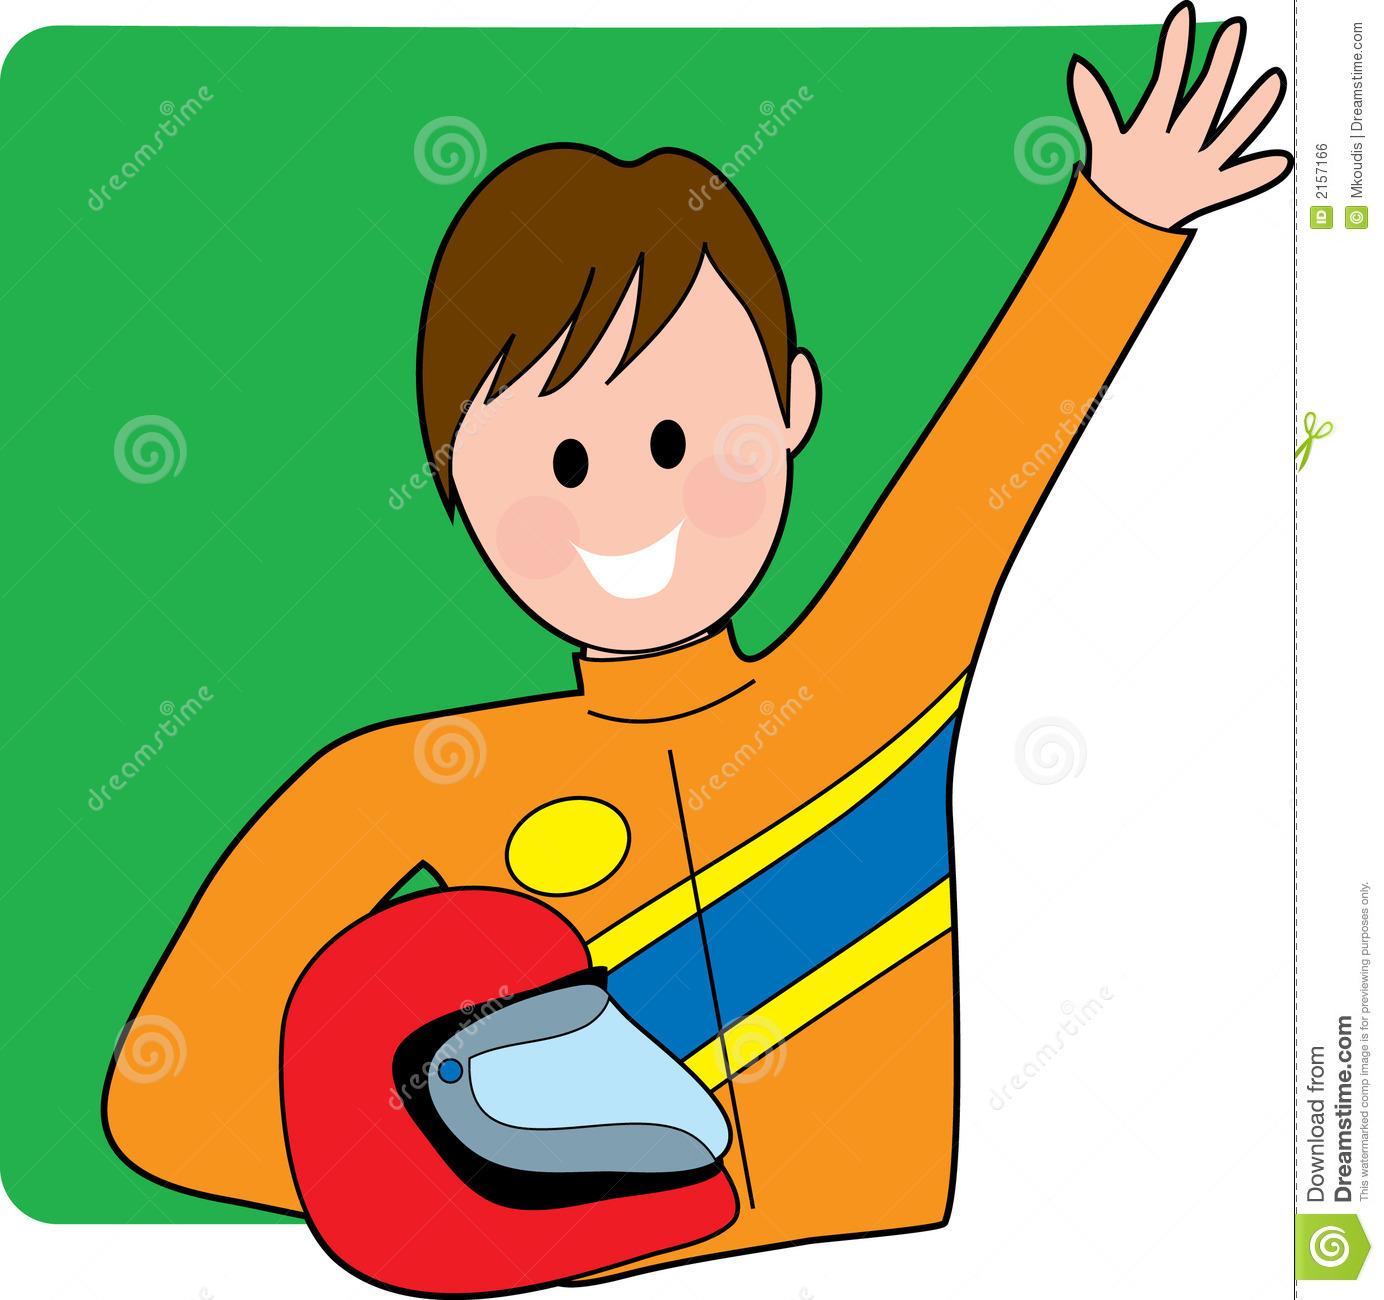 Race Car clipart car driving Driver Clipart Images race%20car%20driver%20clipart Race